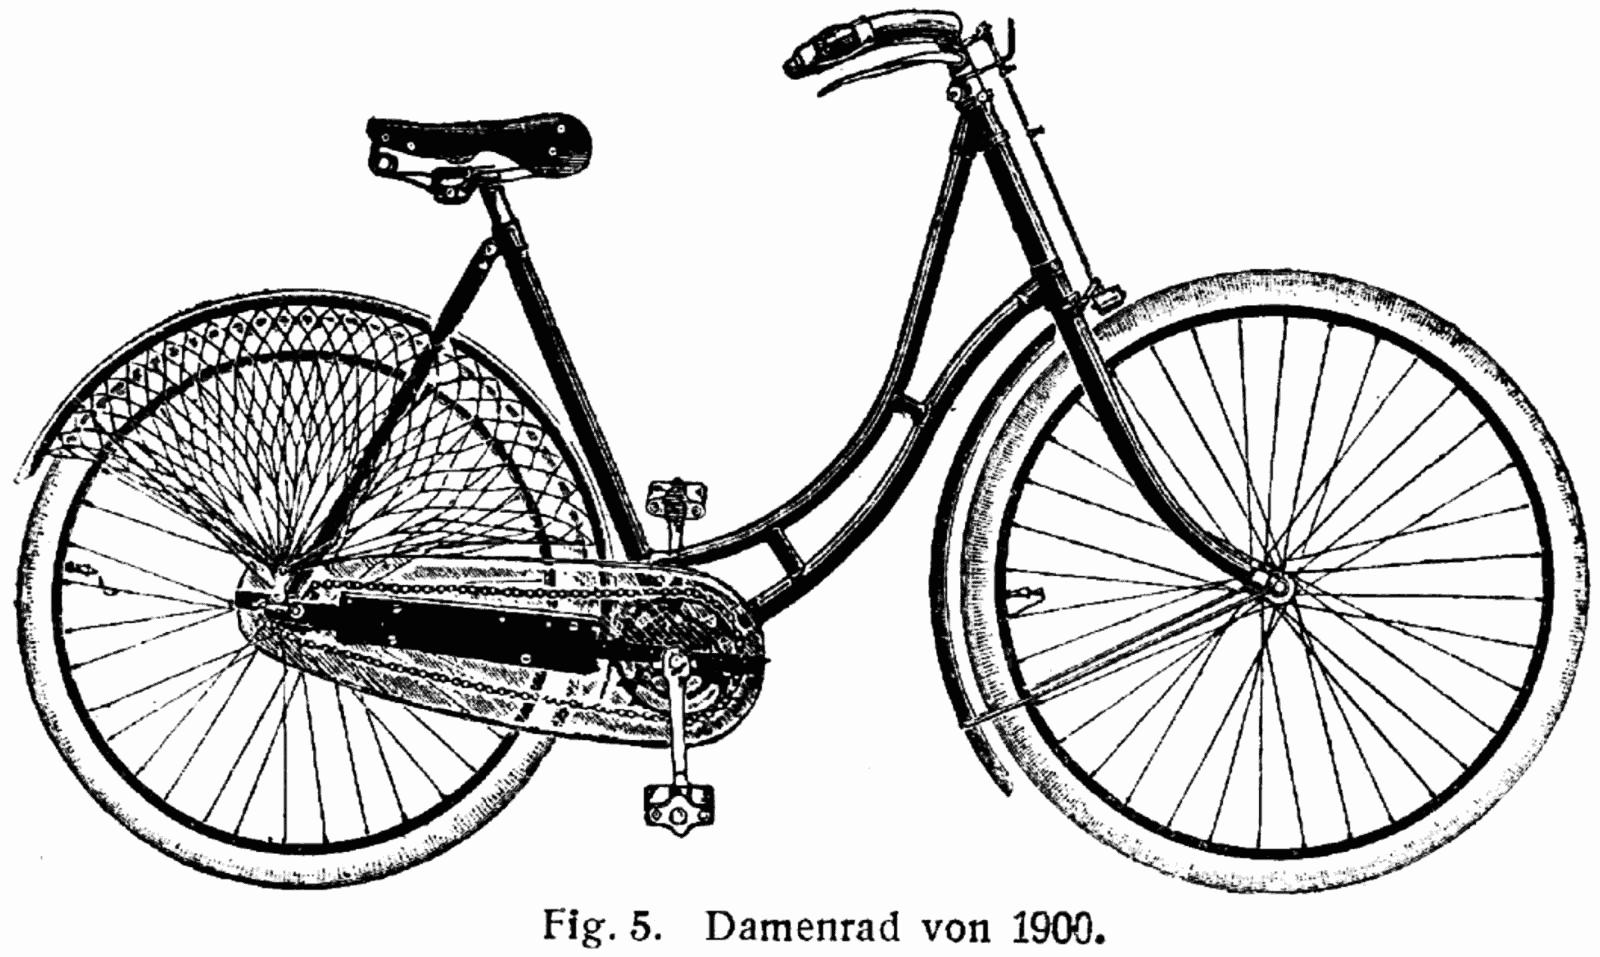 http://upload.wikimedia.org/wikipedia/commons/c/cb/L-Damenrad.png